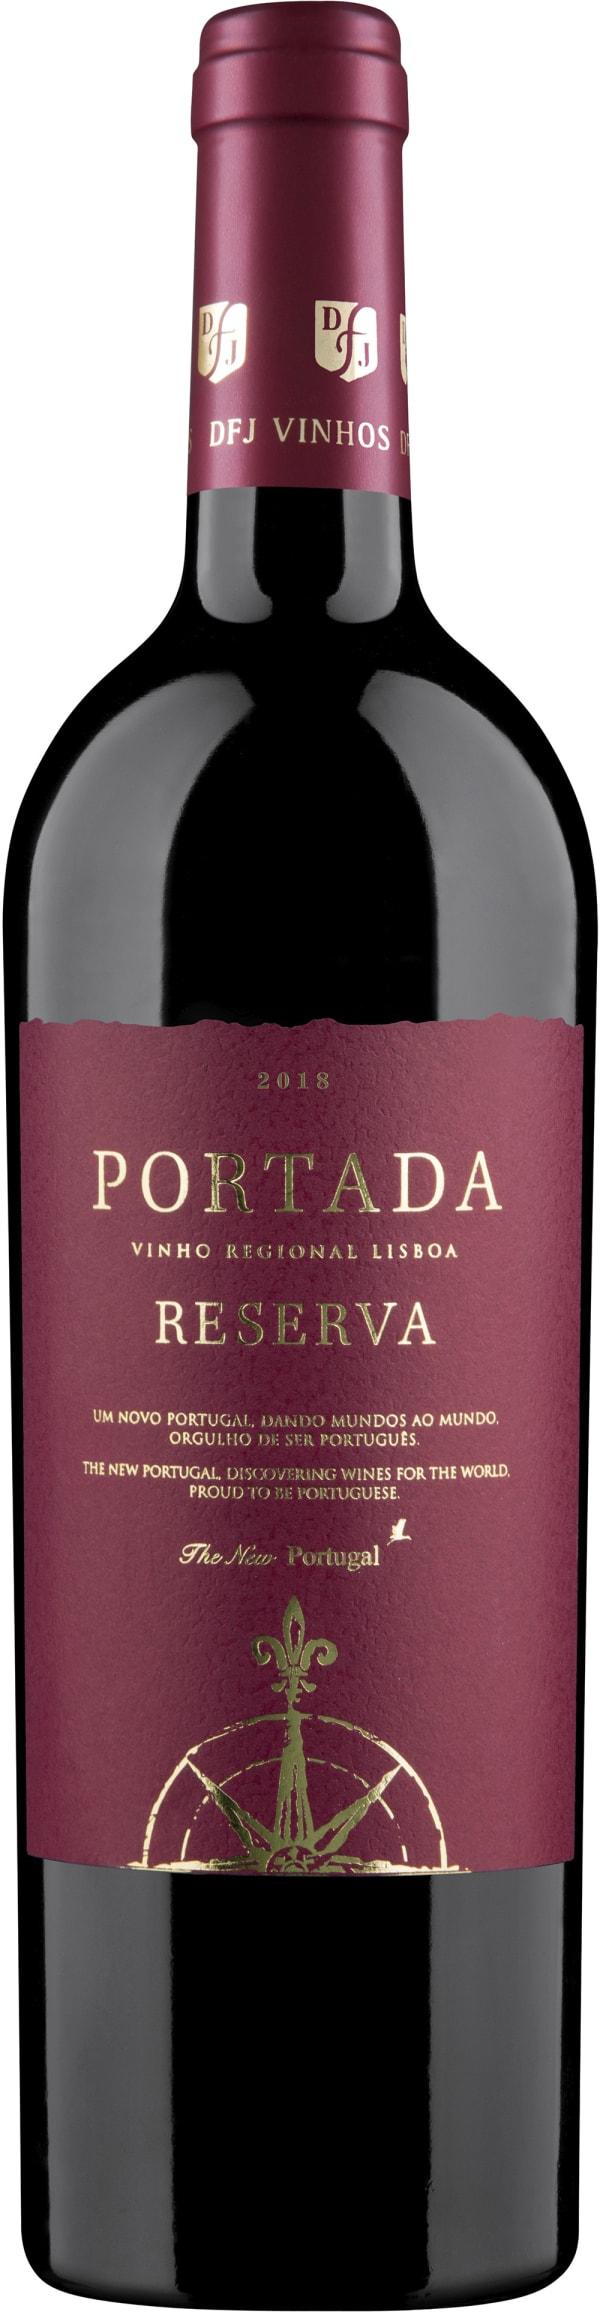 Portada Reserva Red 2014